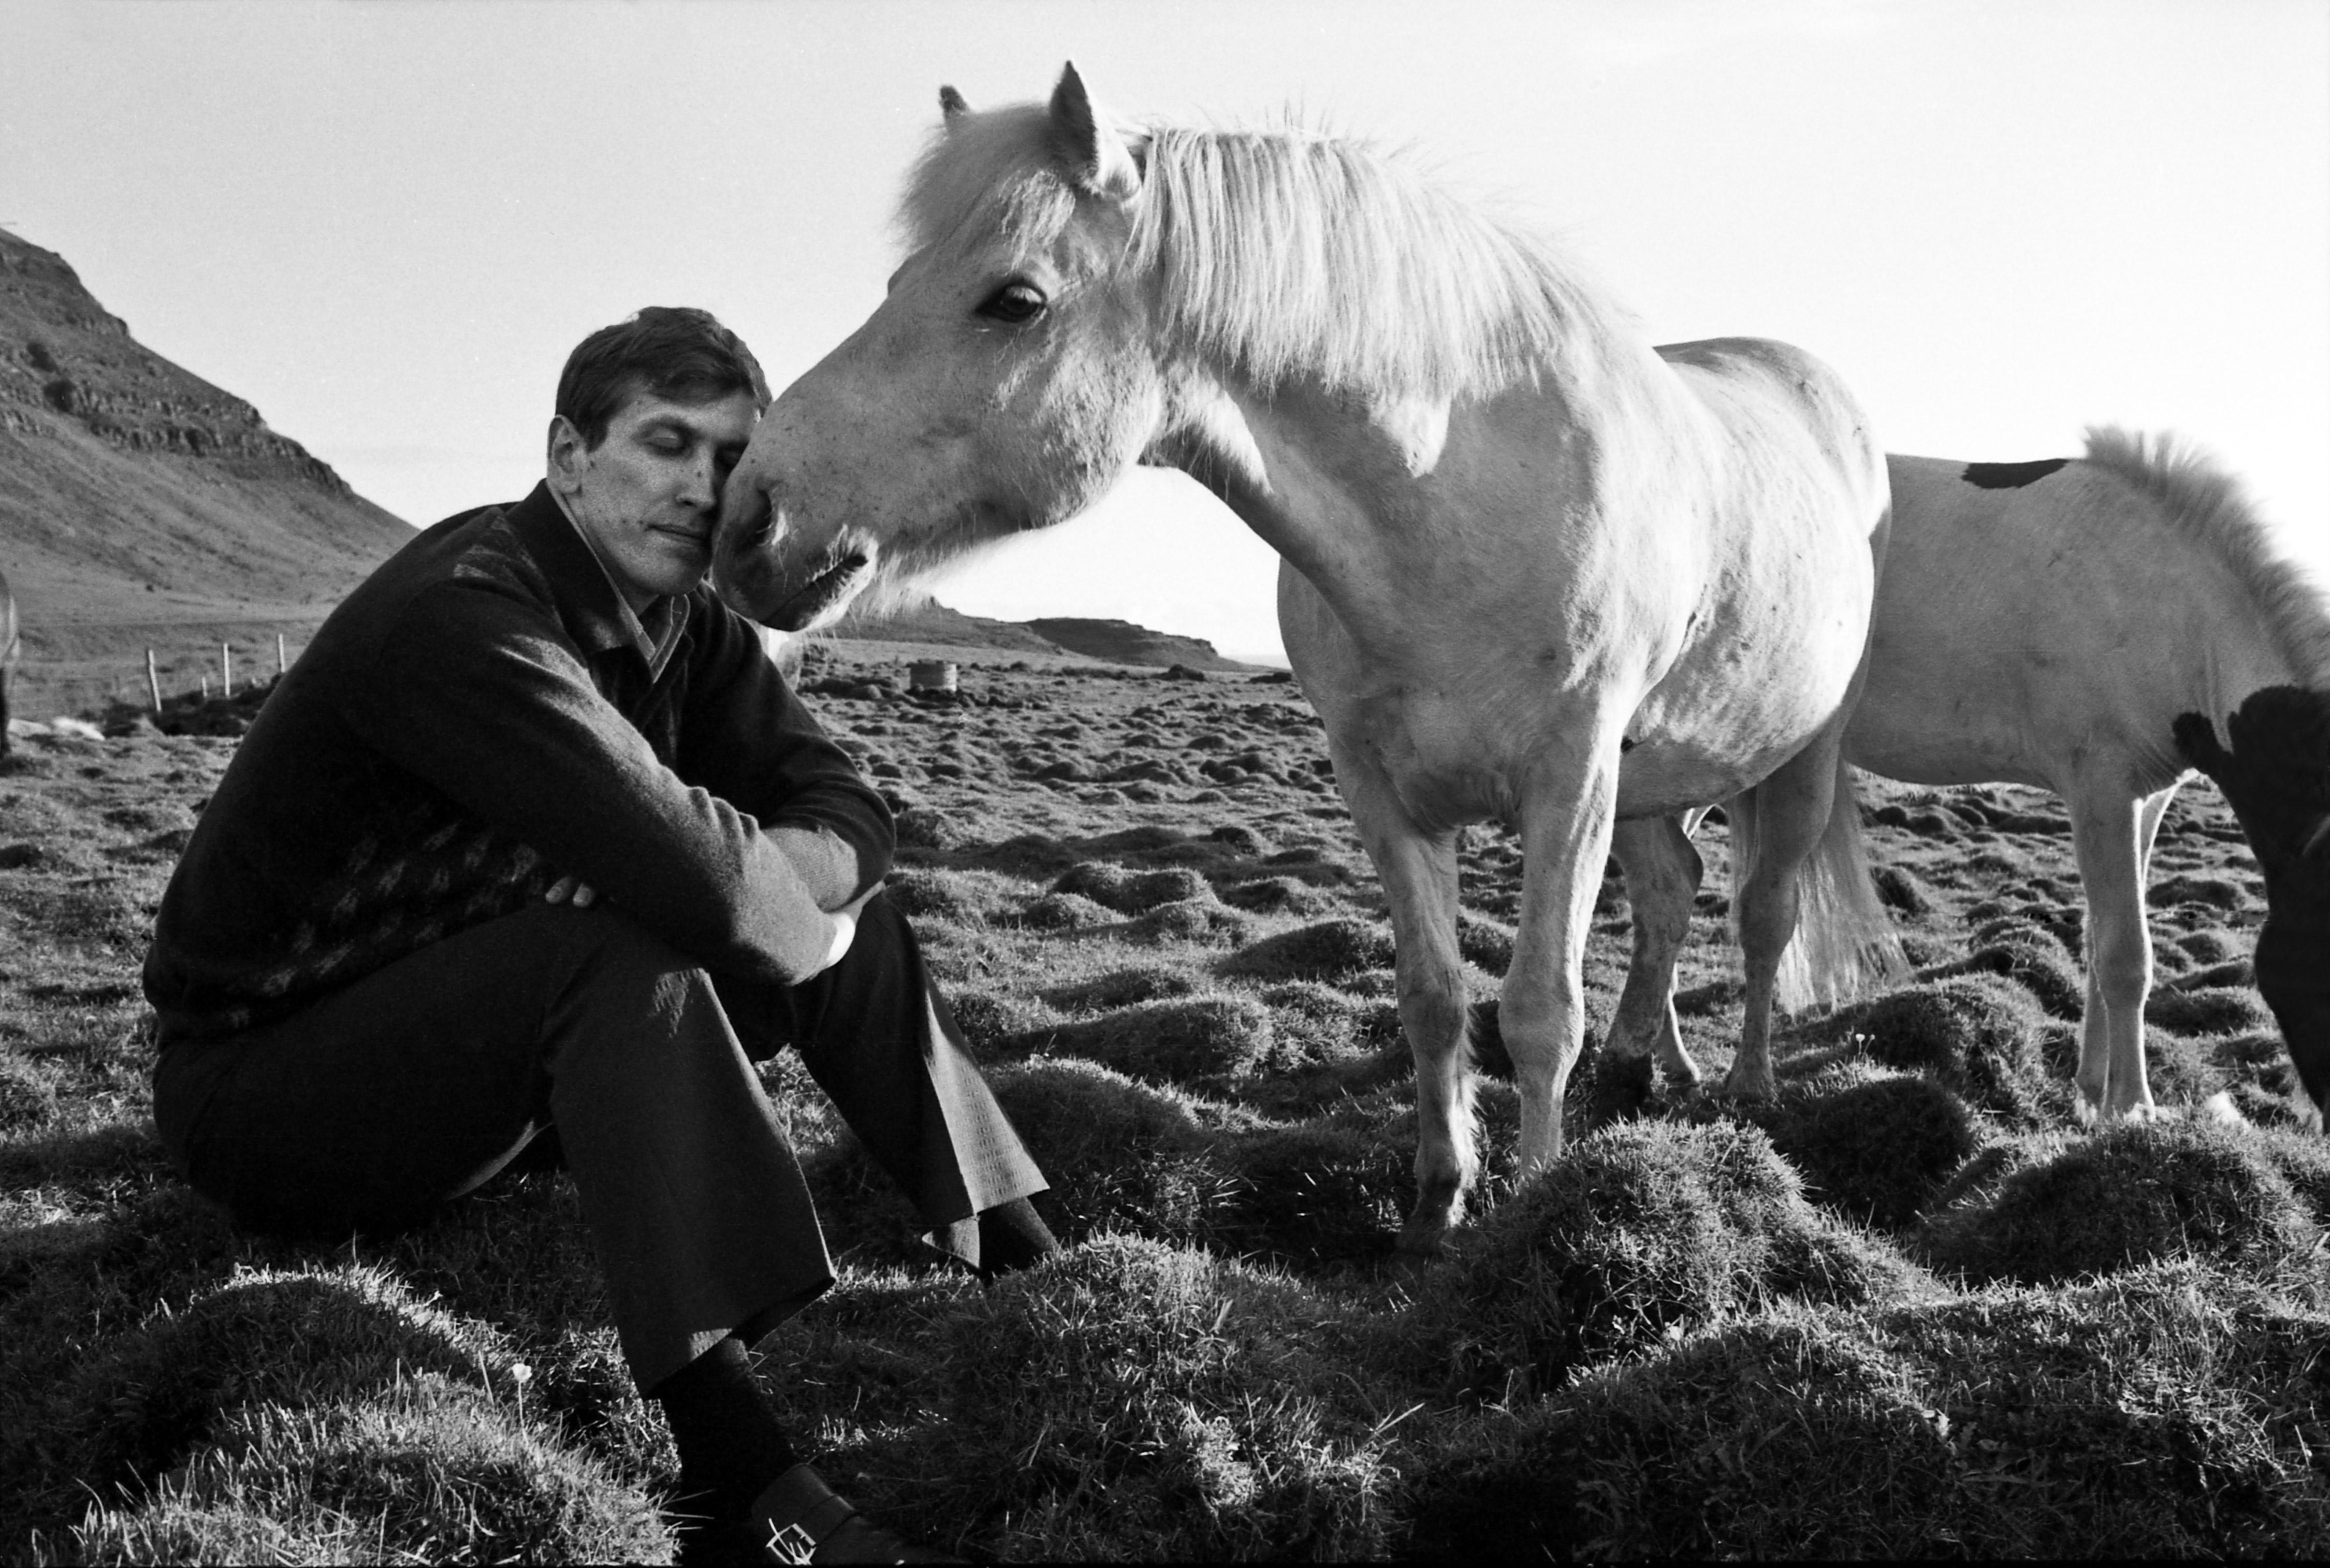 Bobby Fischer with horse in Reykjavik, Iceland, 1972.